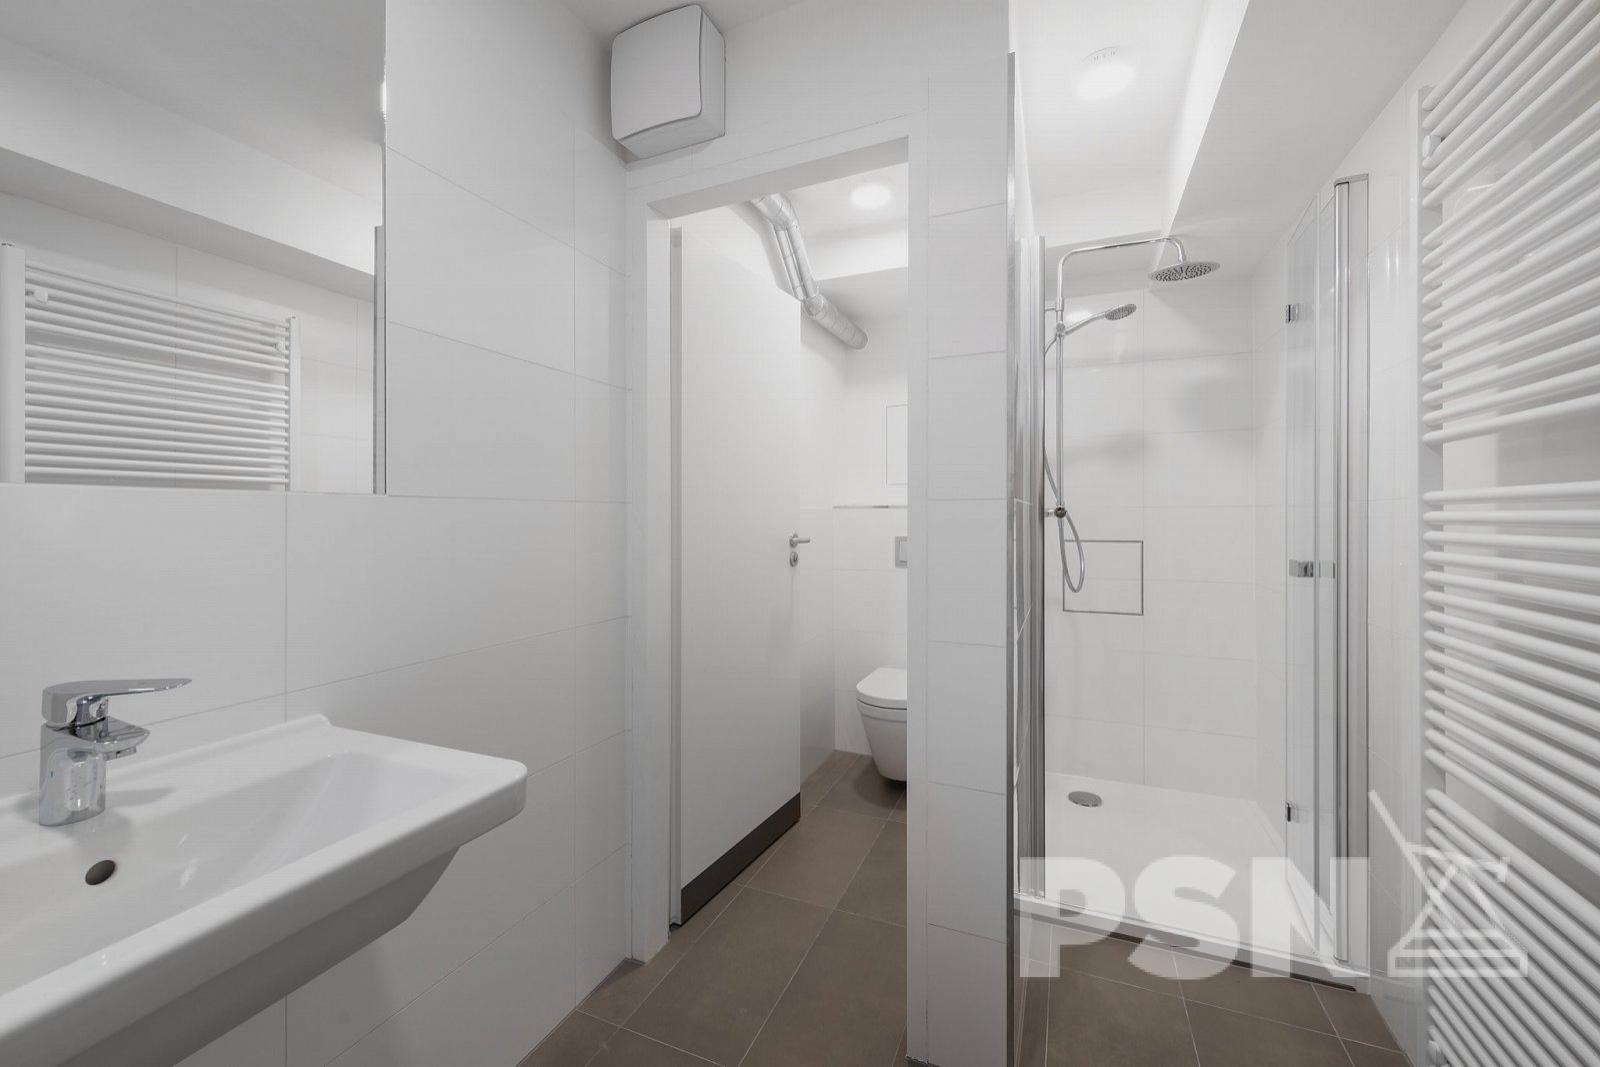 Accommodation unit